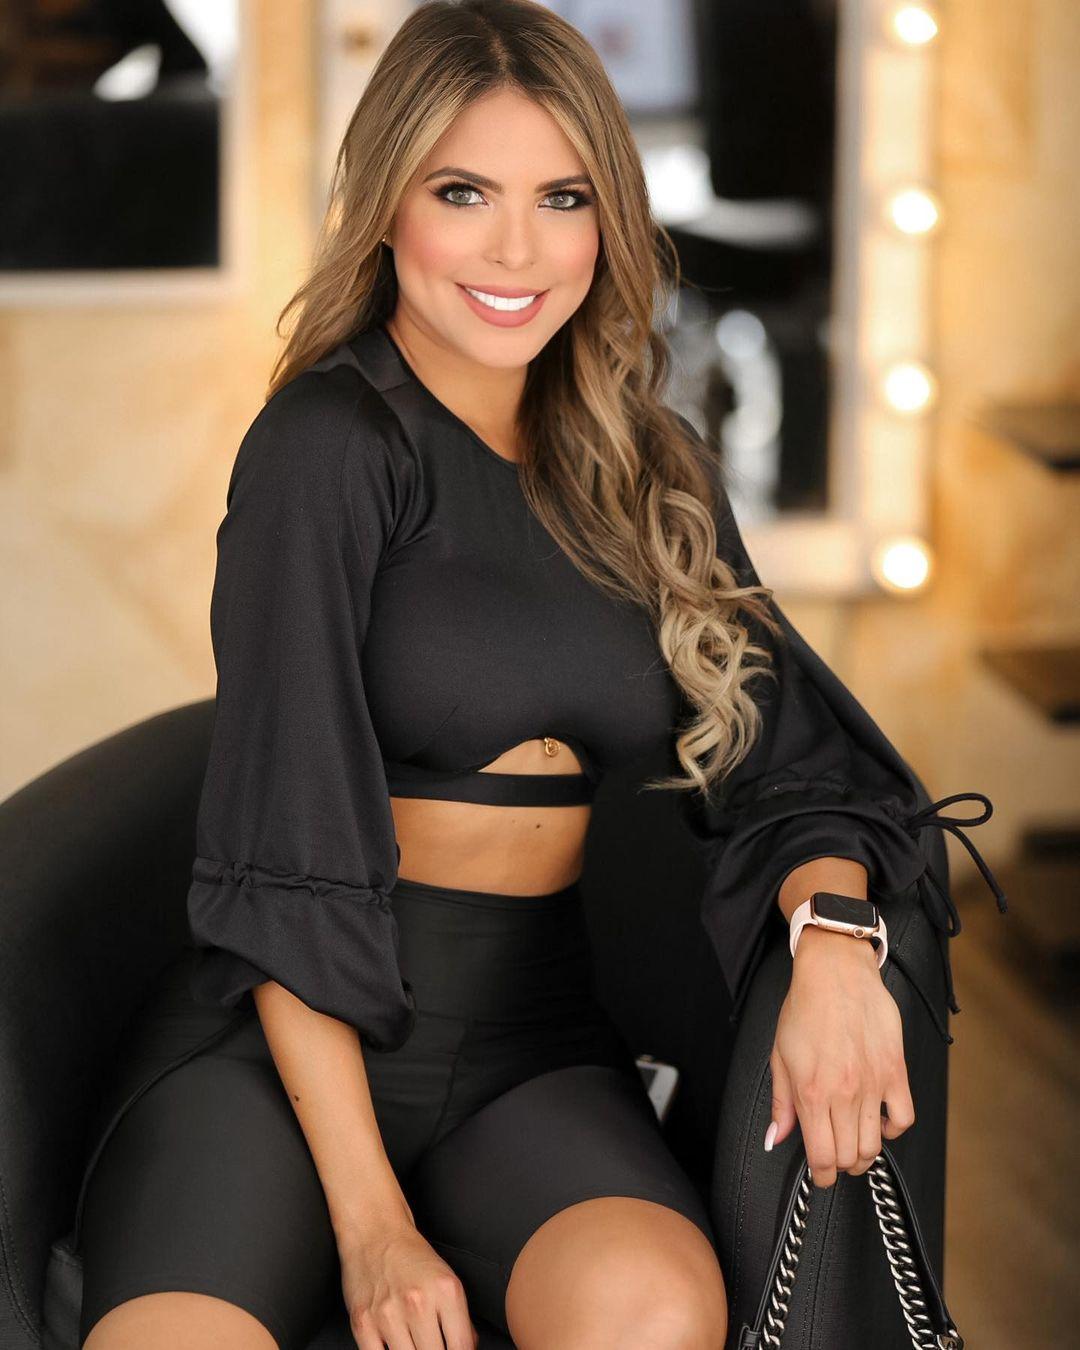 Jennifer-Giraldino-Wallpapers-Insta-Fit-Bio-4